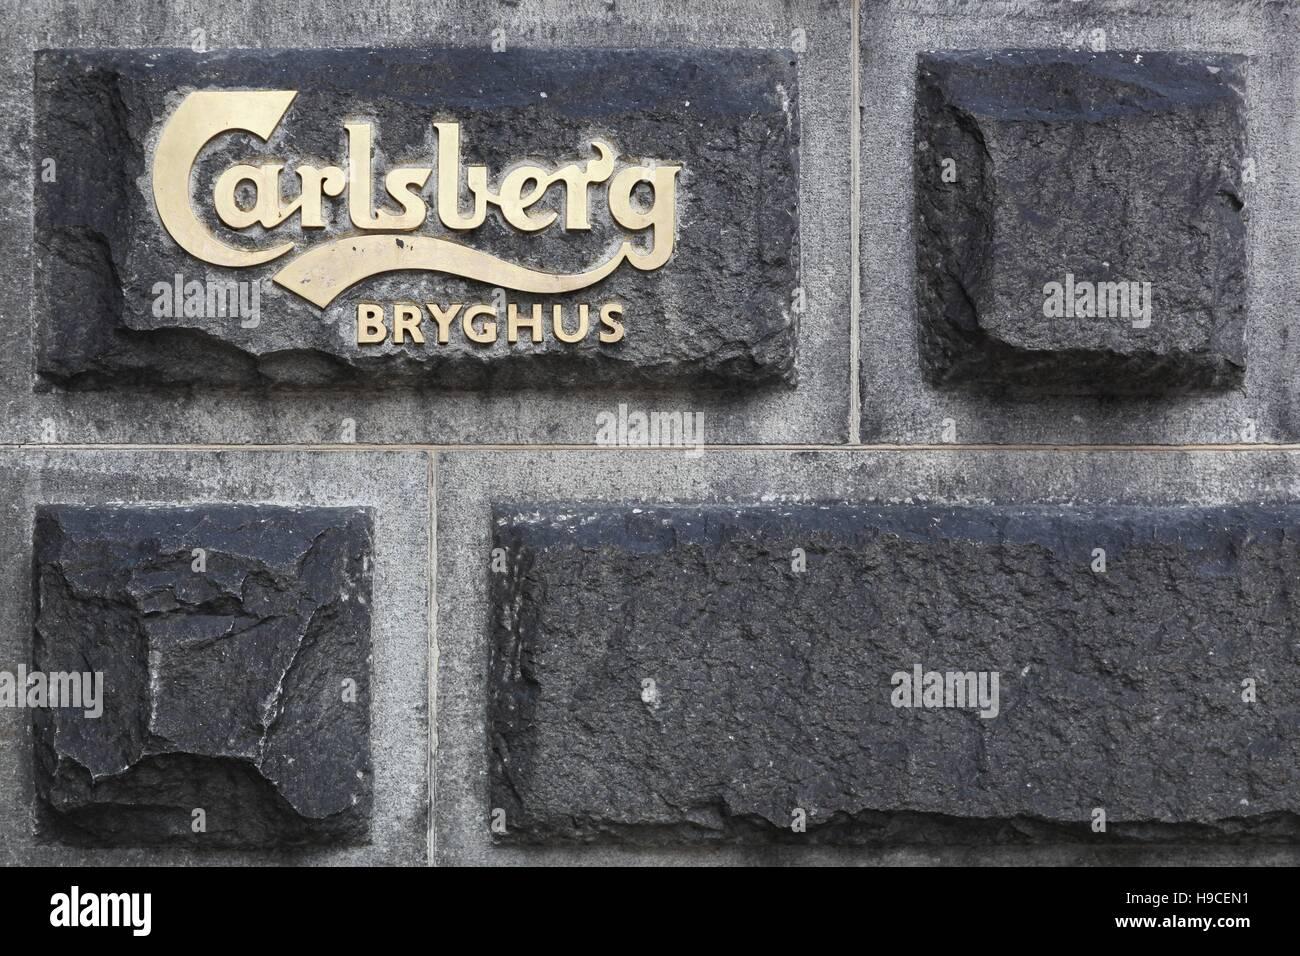 Carlsberg brewery sign in Copenhagen, Denmark - Stock Image